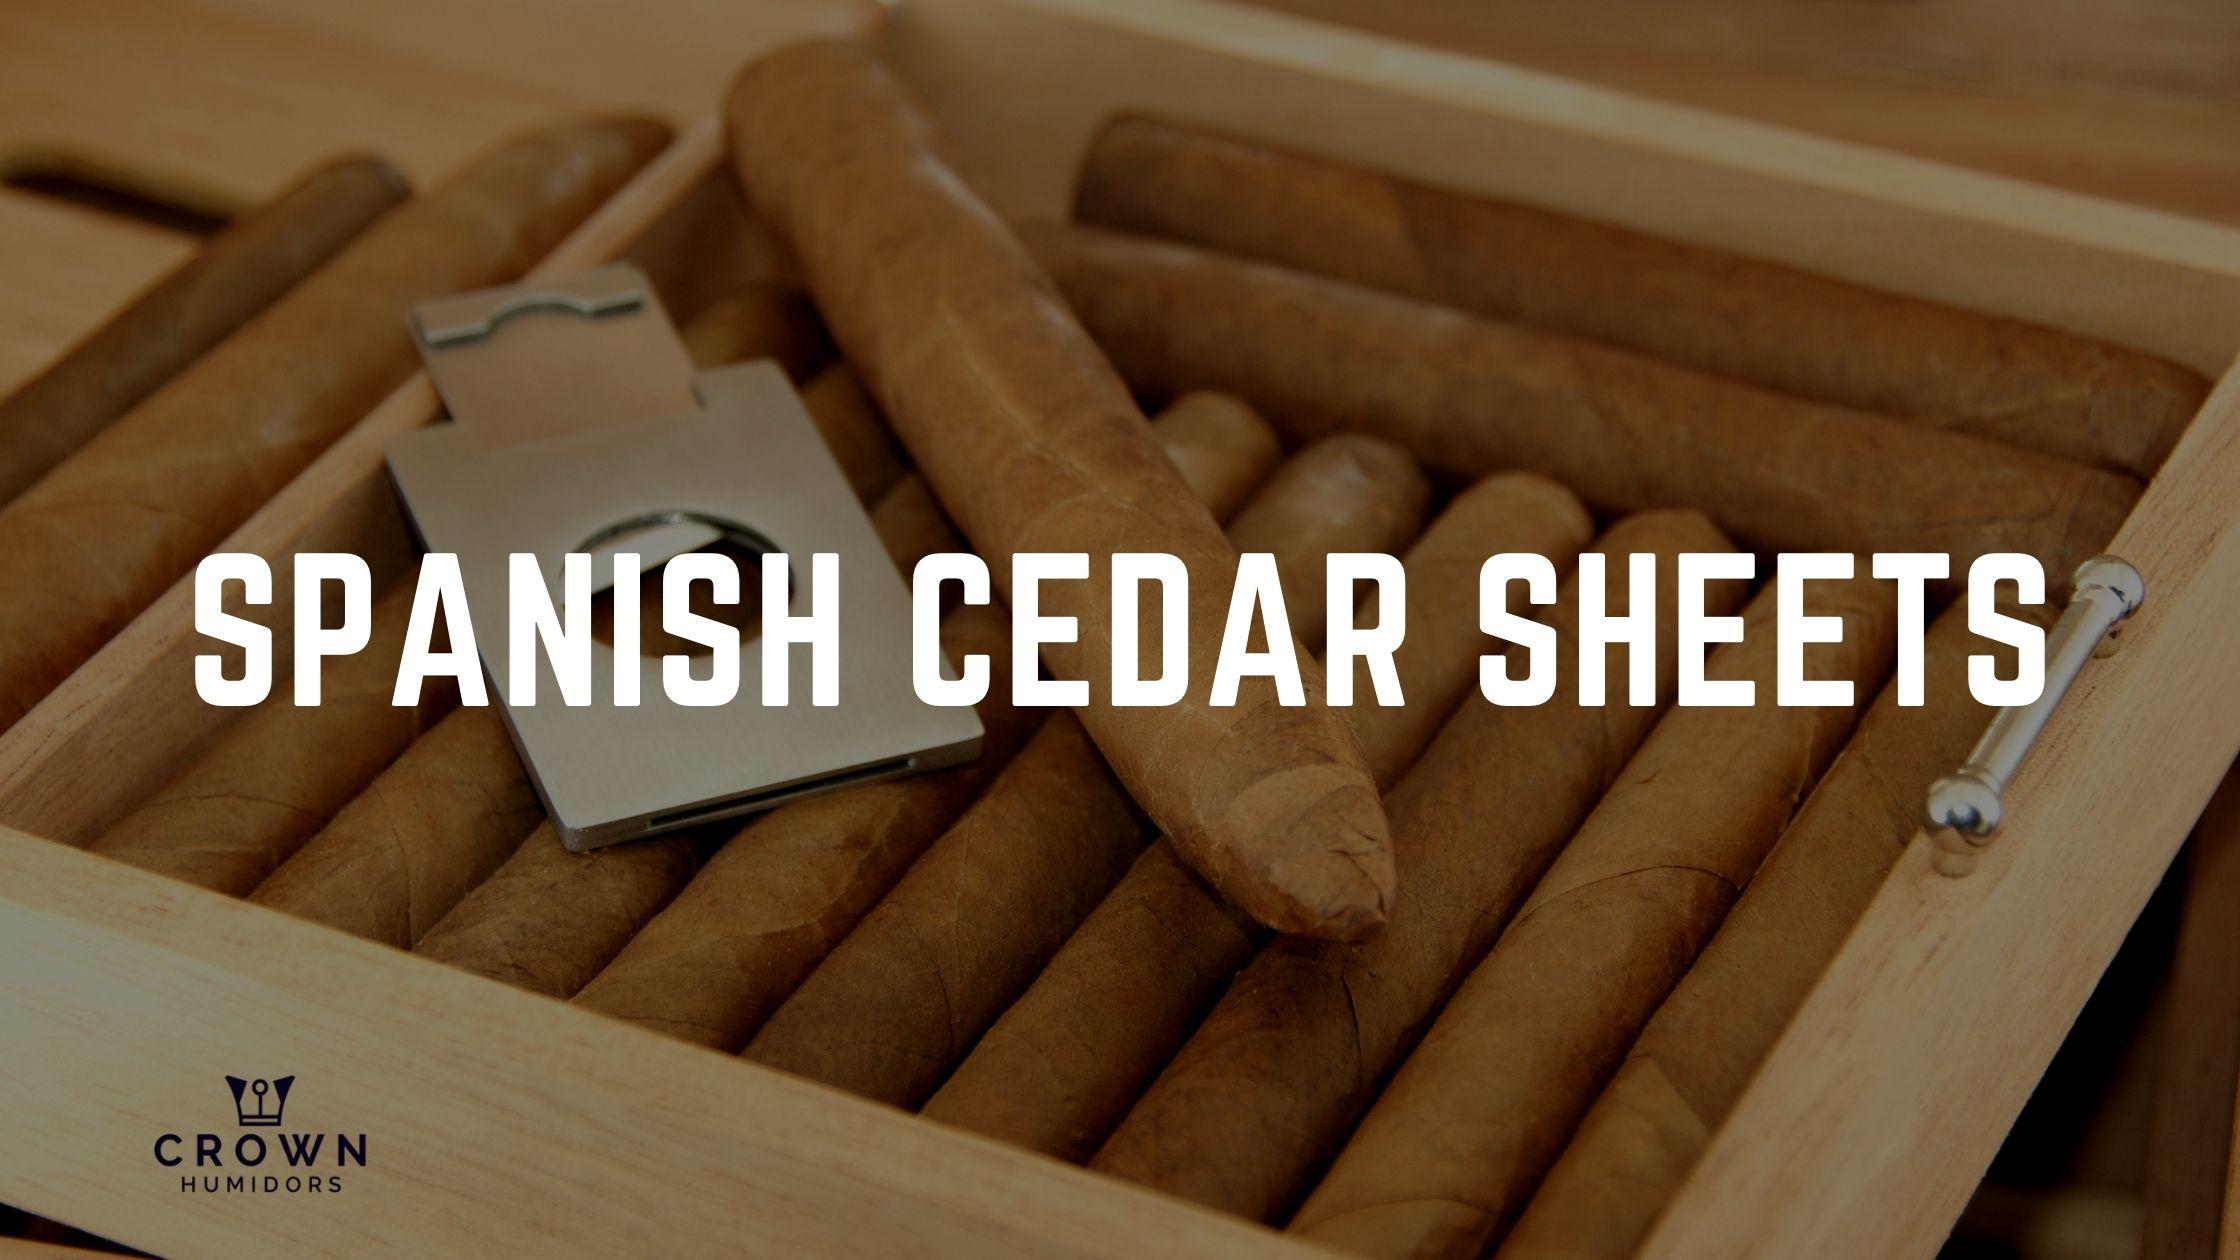 SPANISH CEDAR SHEETS